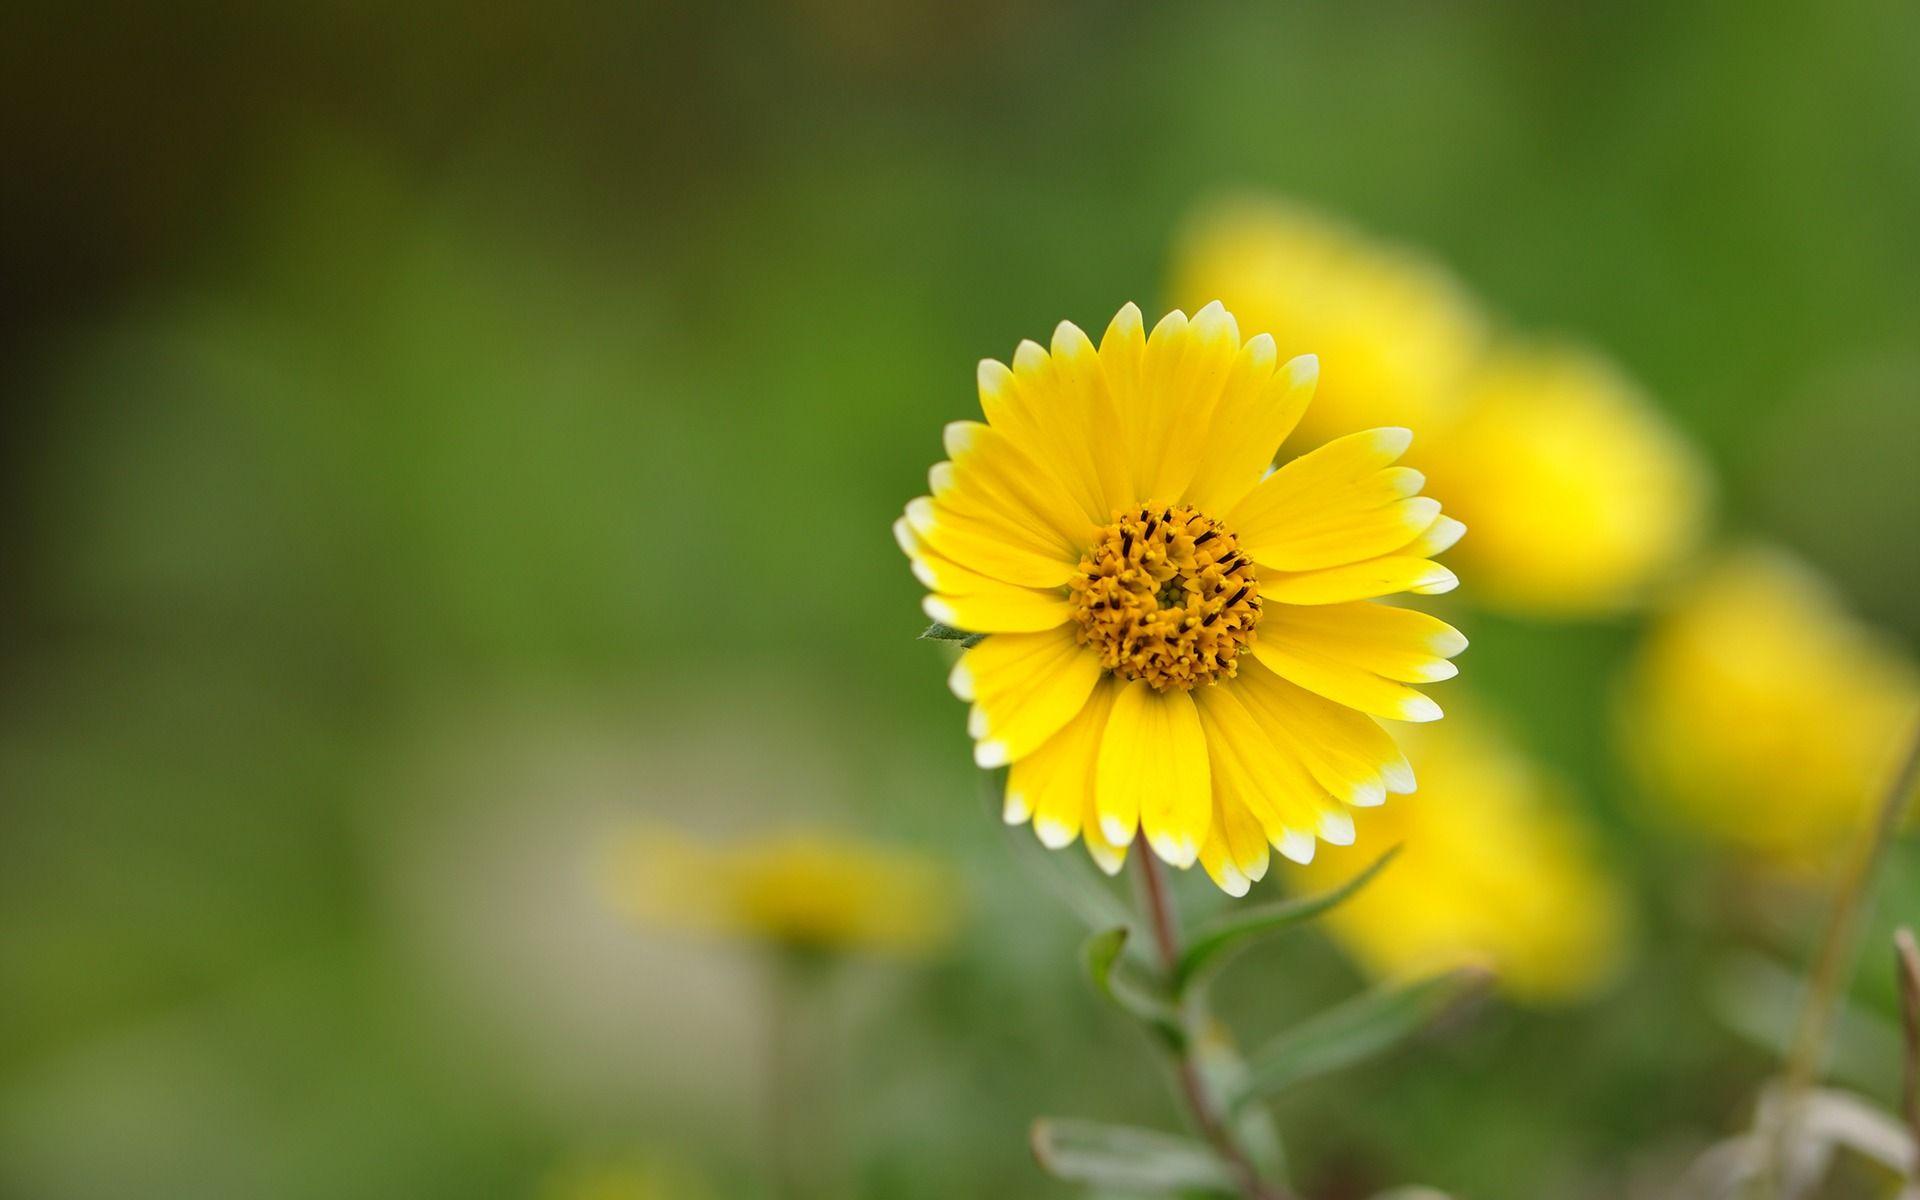 Yellow Flower Wallpapers Hd Free Fleurs Pinterest Flower